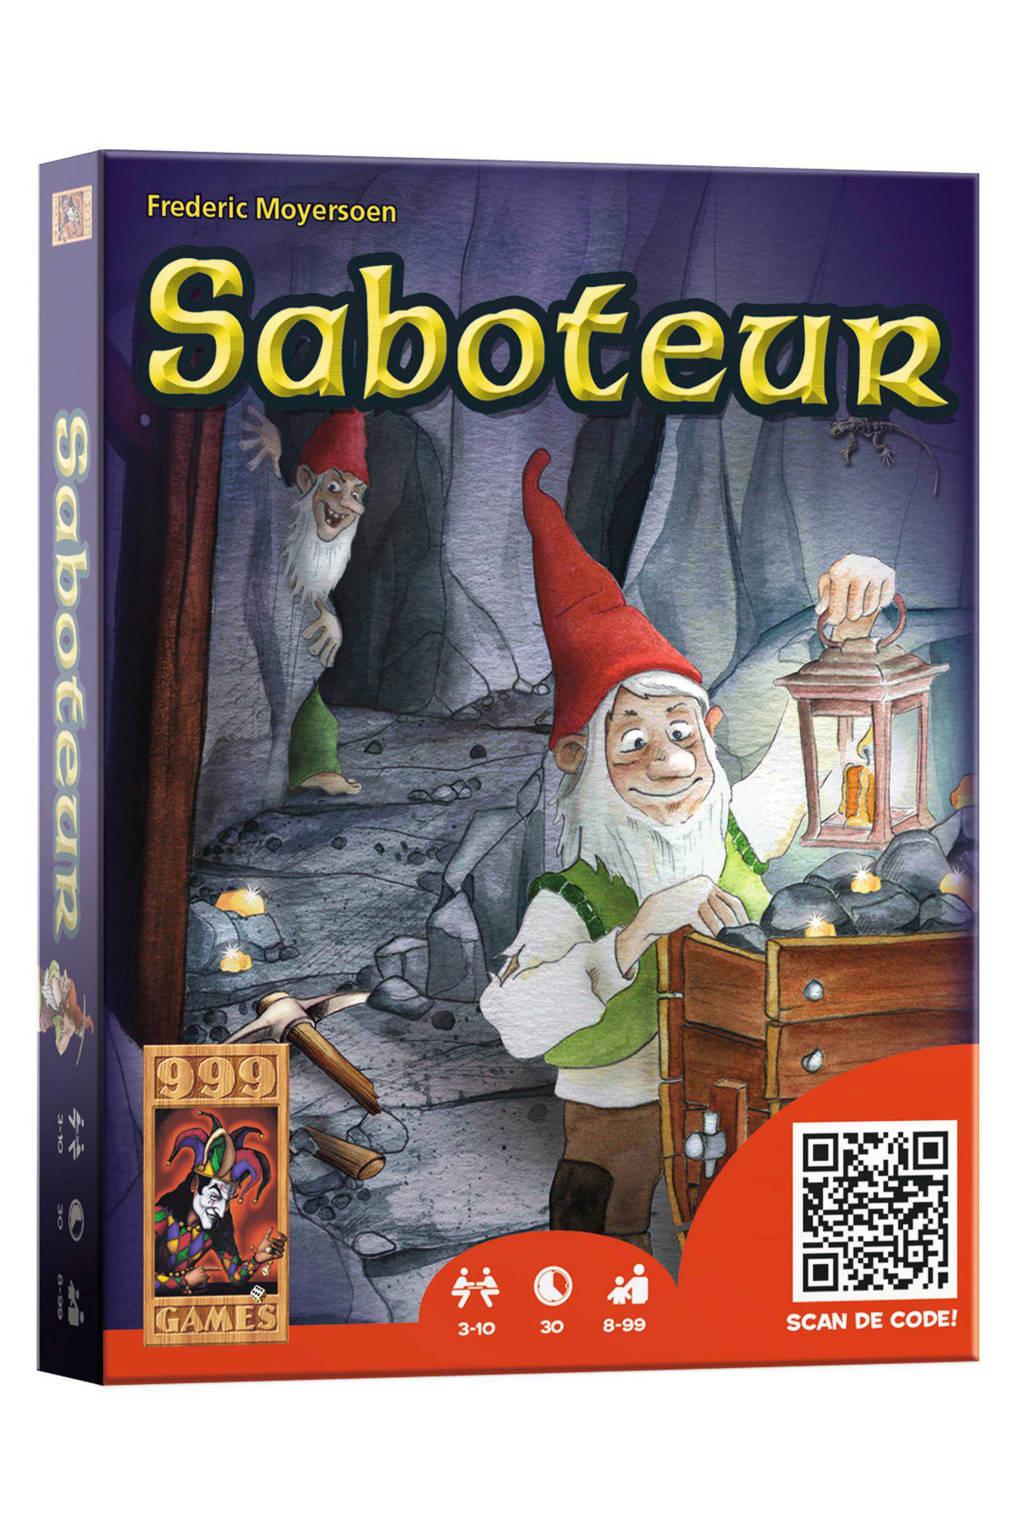 999 Games SABOTEUR kaartspel